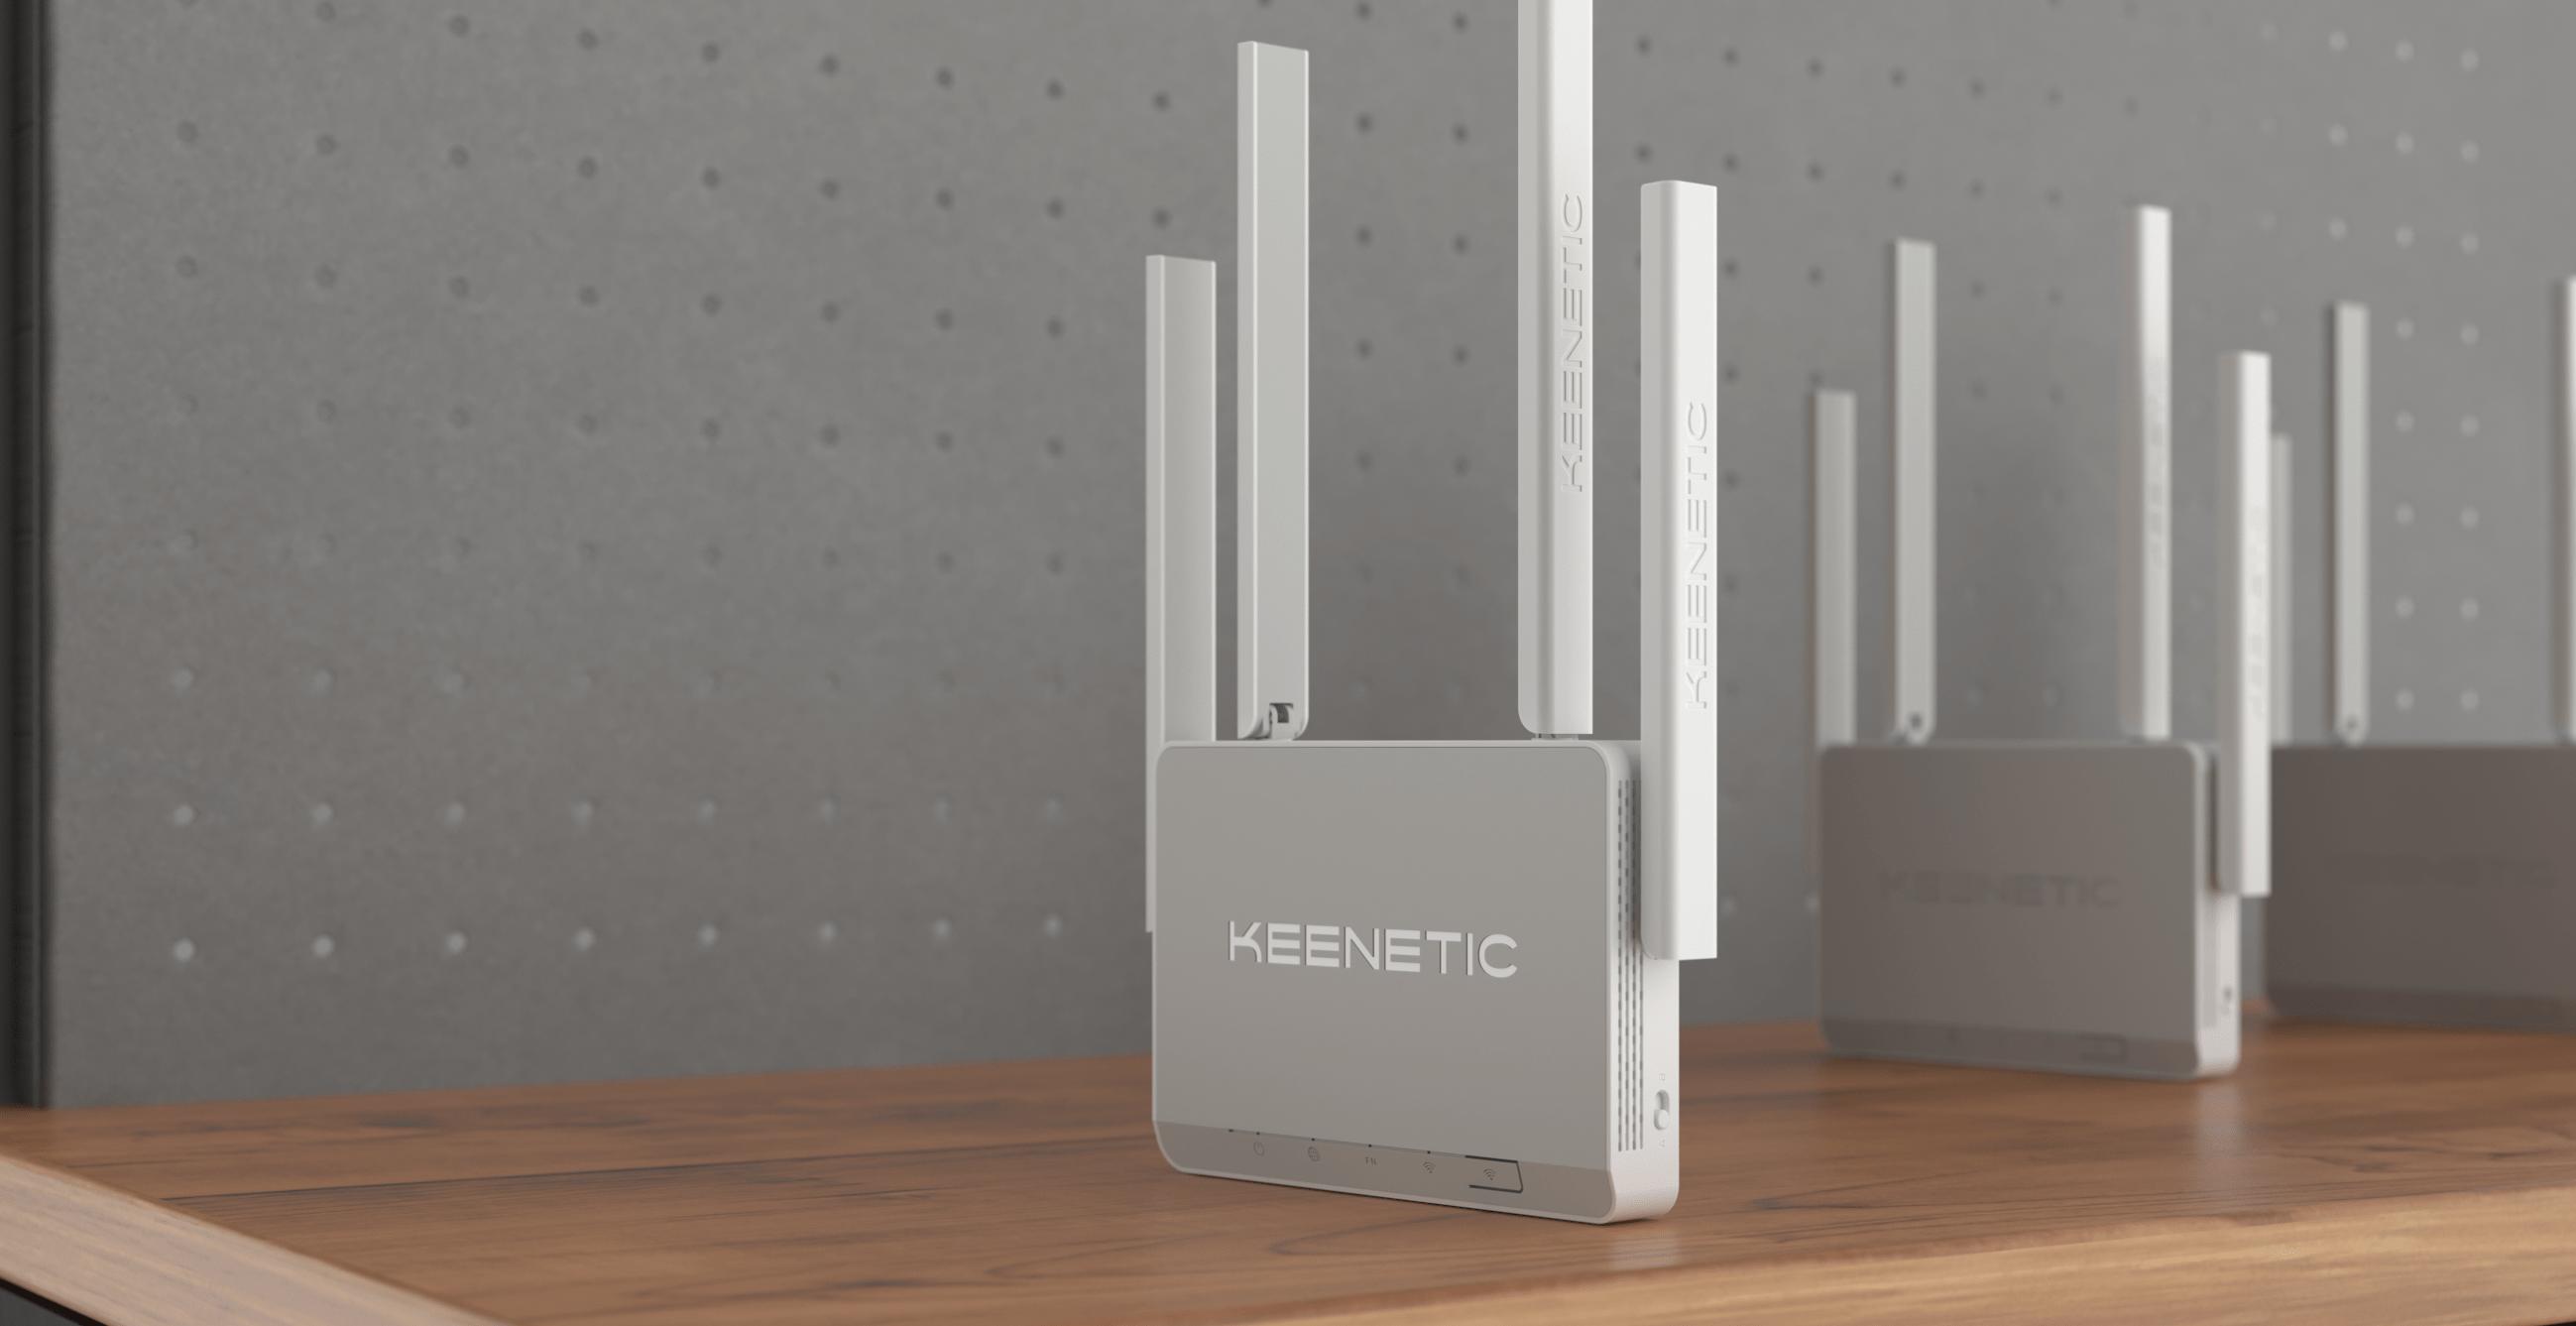 Keenetic Extra (KN-1711)